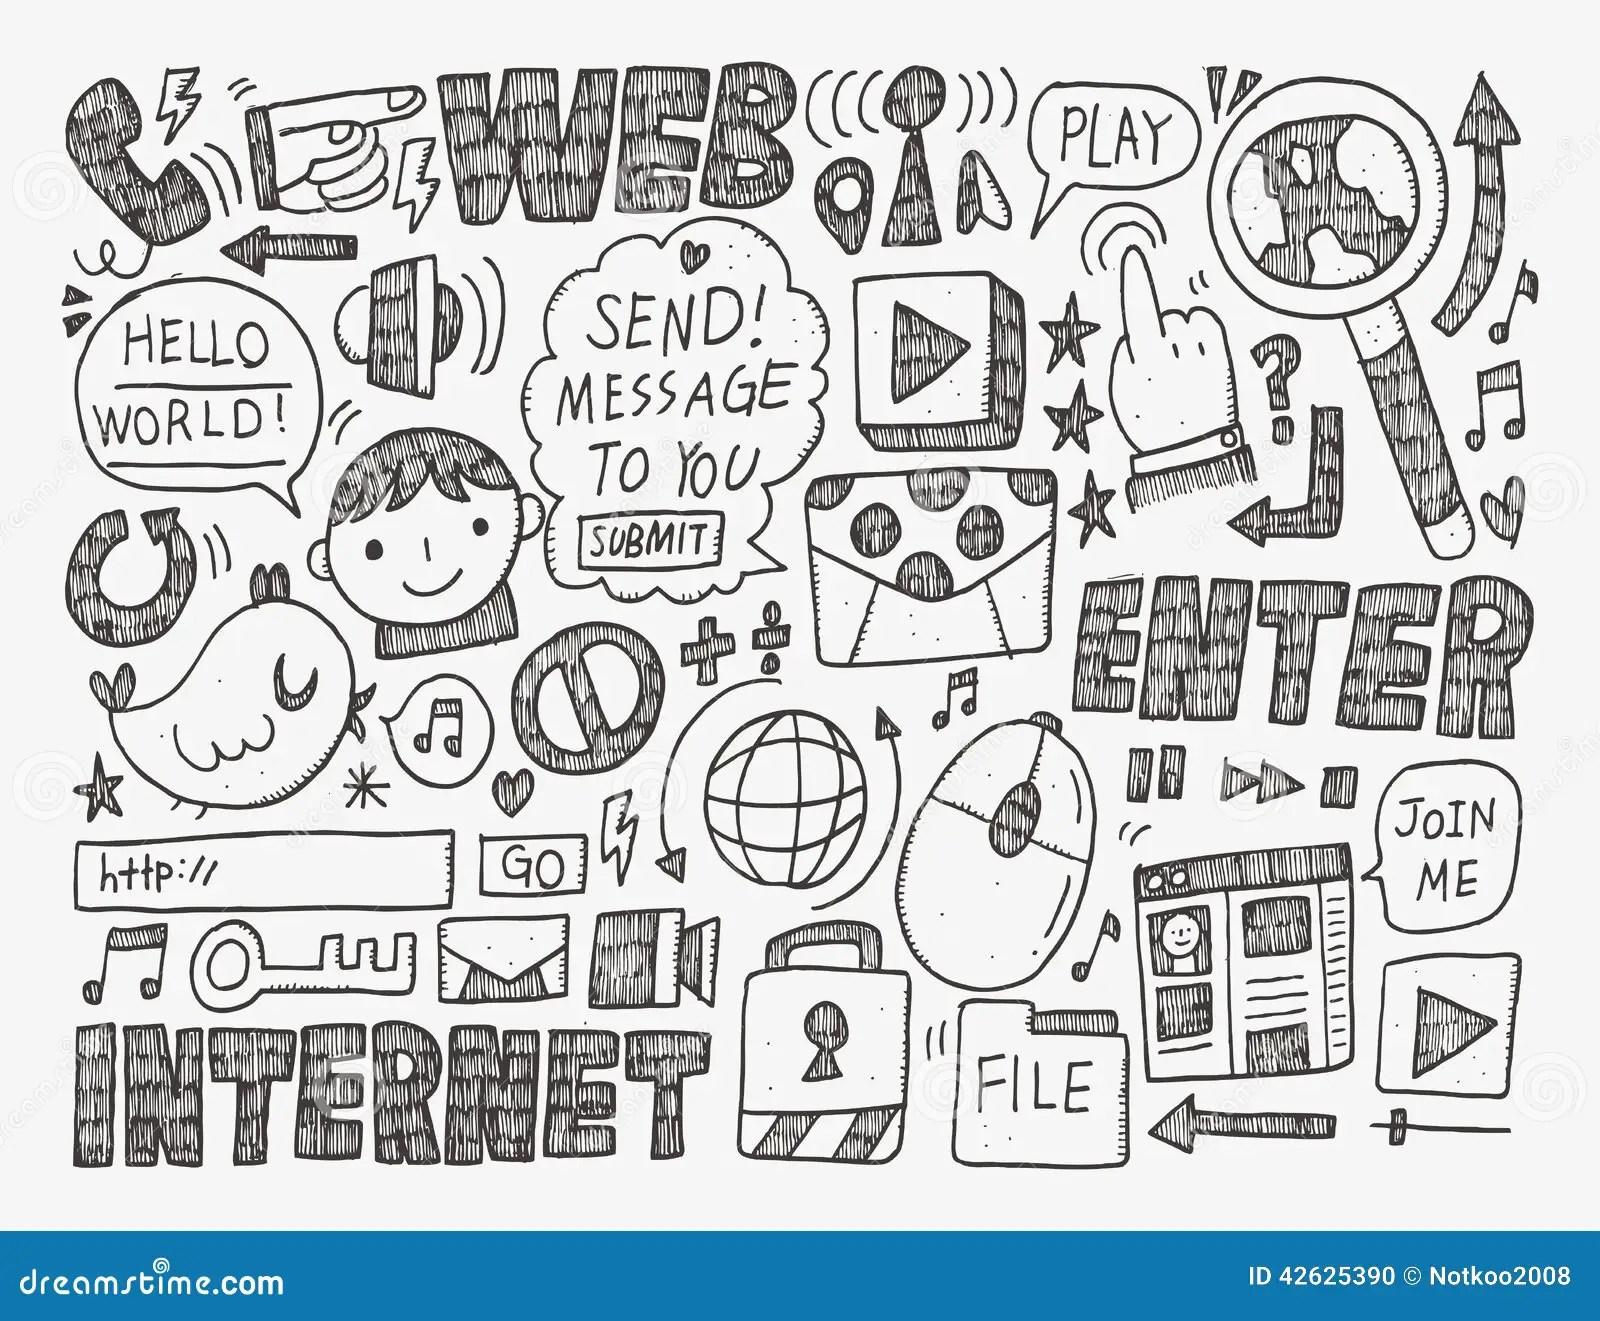 Doodle Internet Web Background Stock Vector